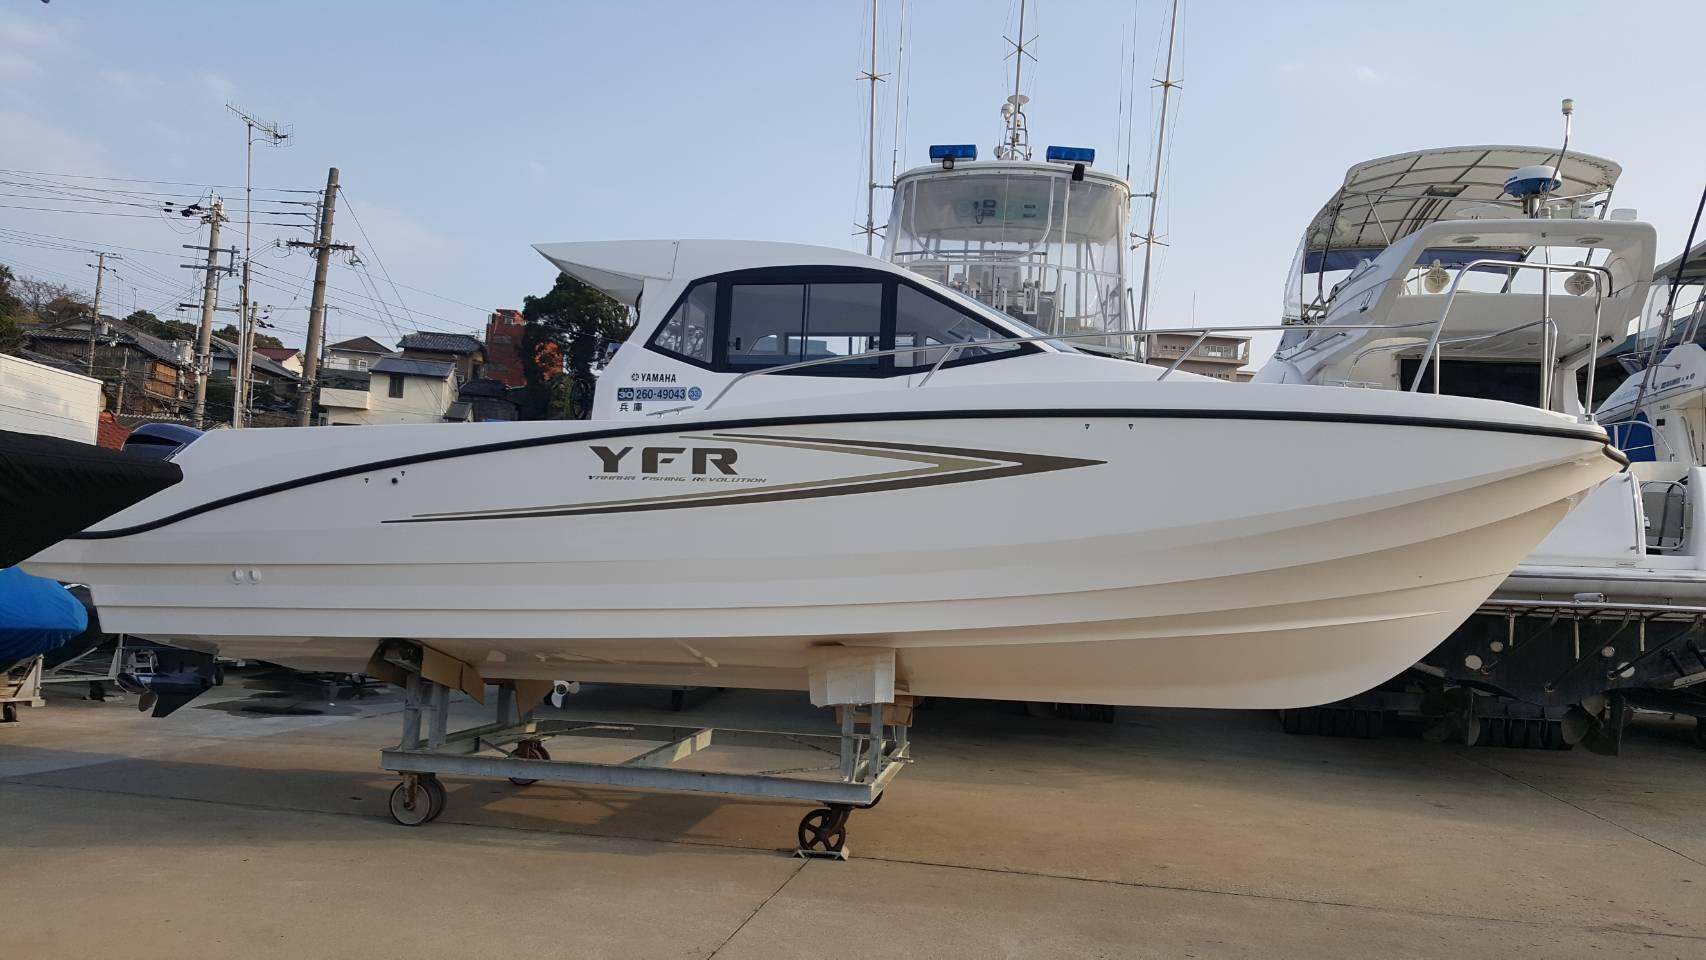 harima marinaです!Garminデモ艇をマジ体験!Ver.2.0。